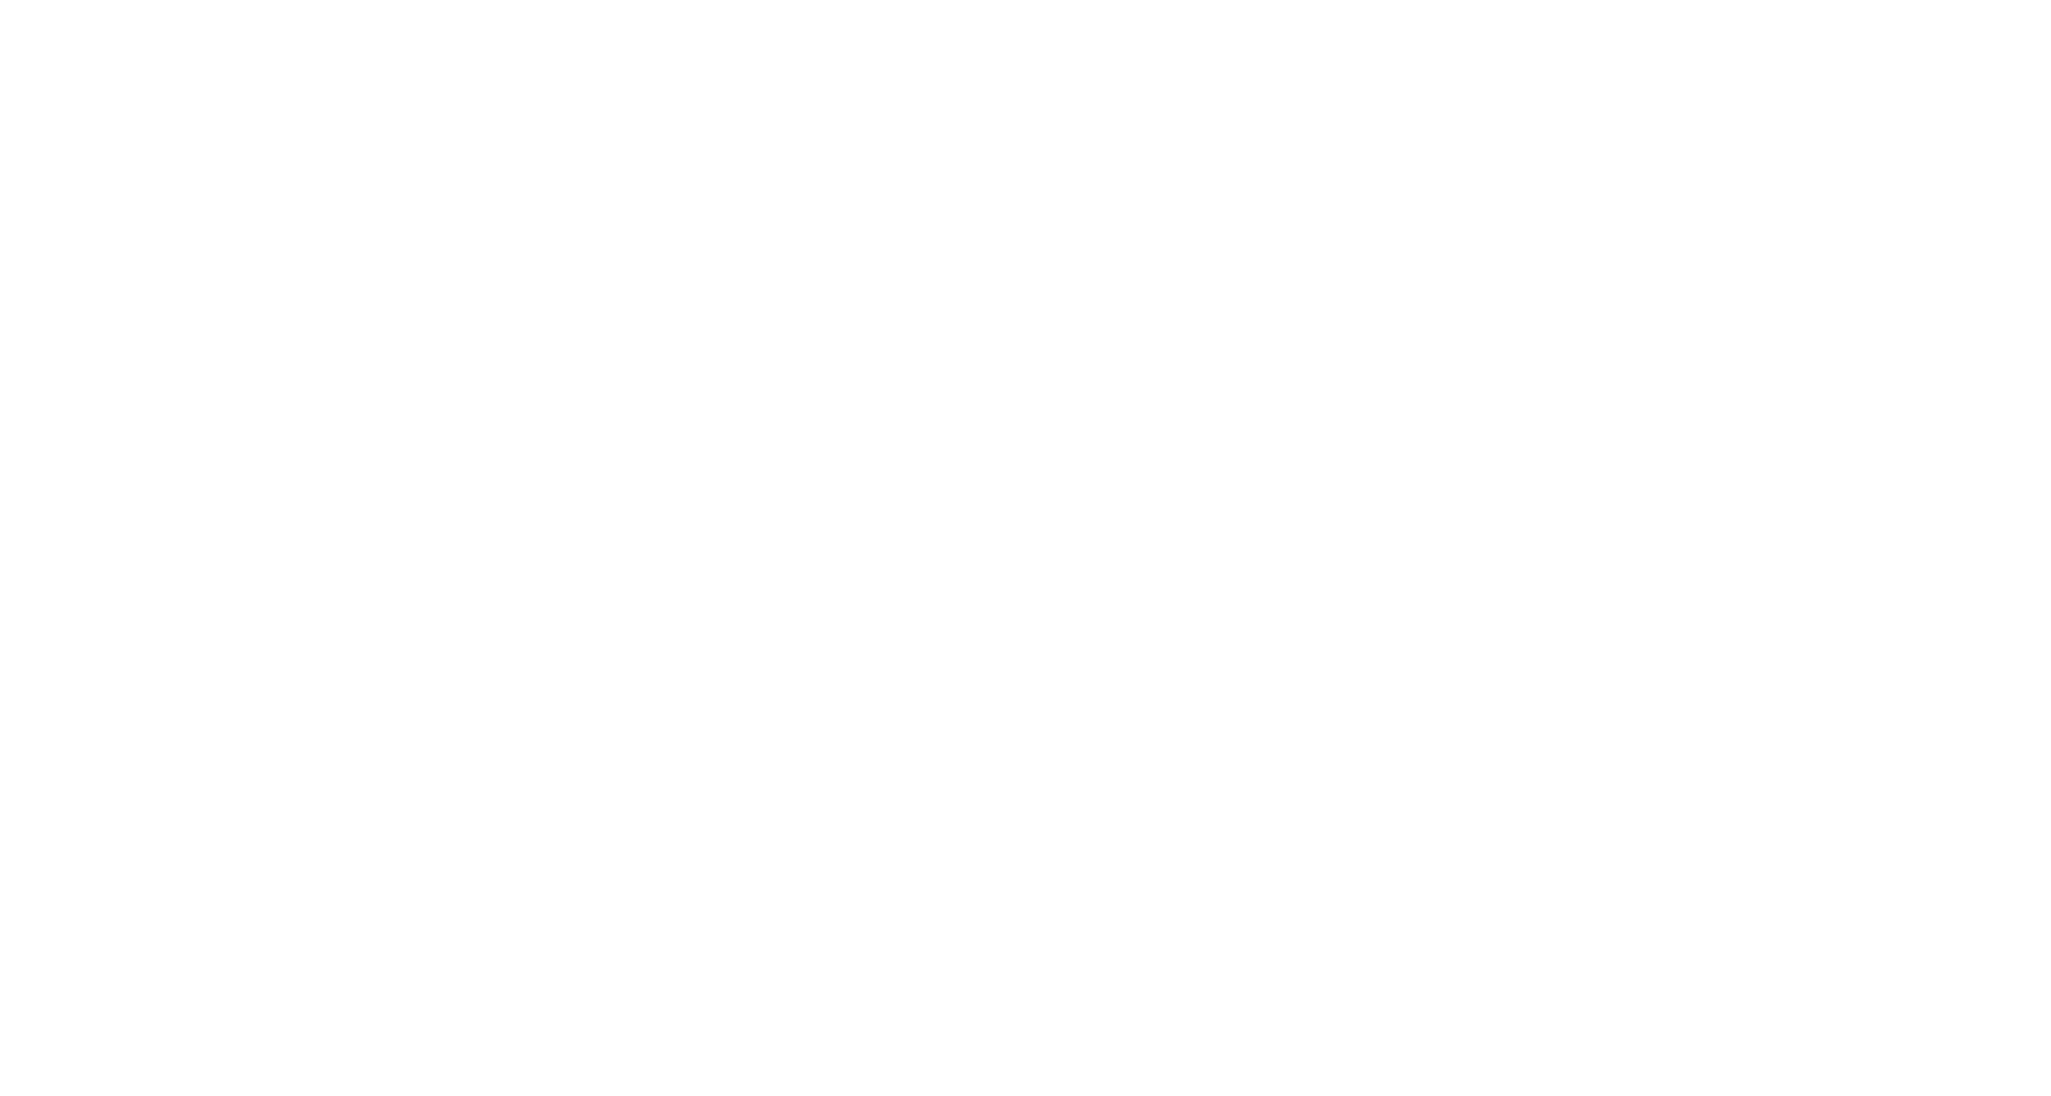 Logo viacash-barzahlen